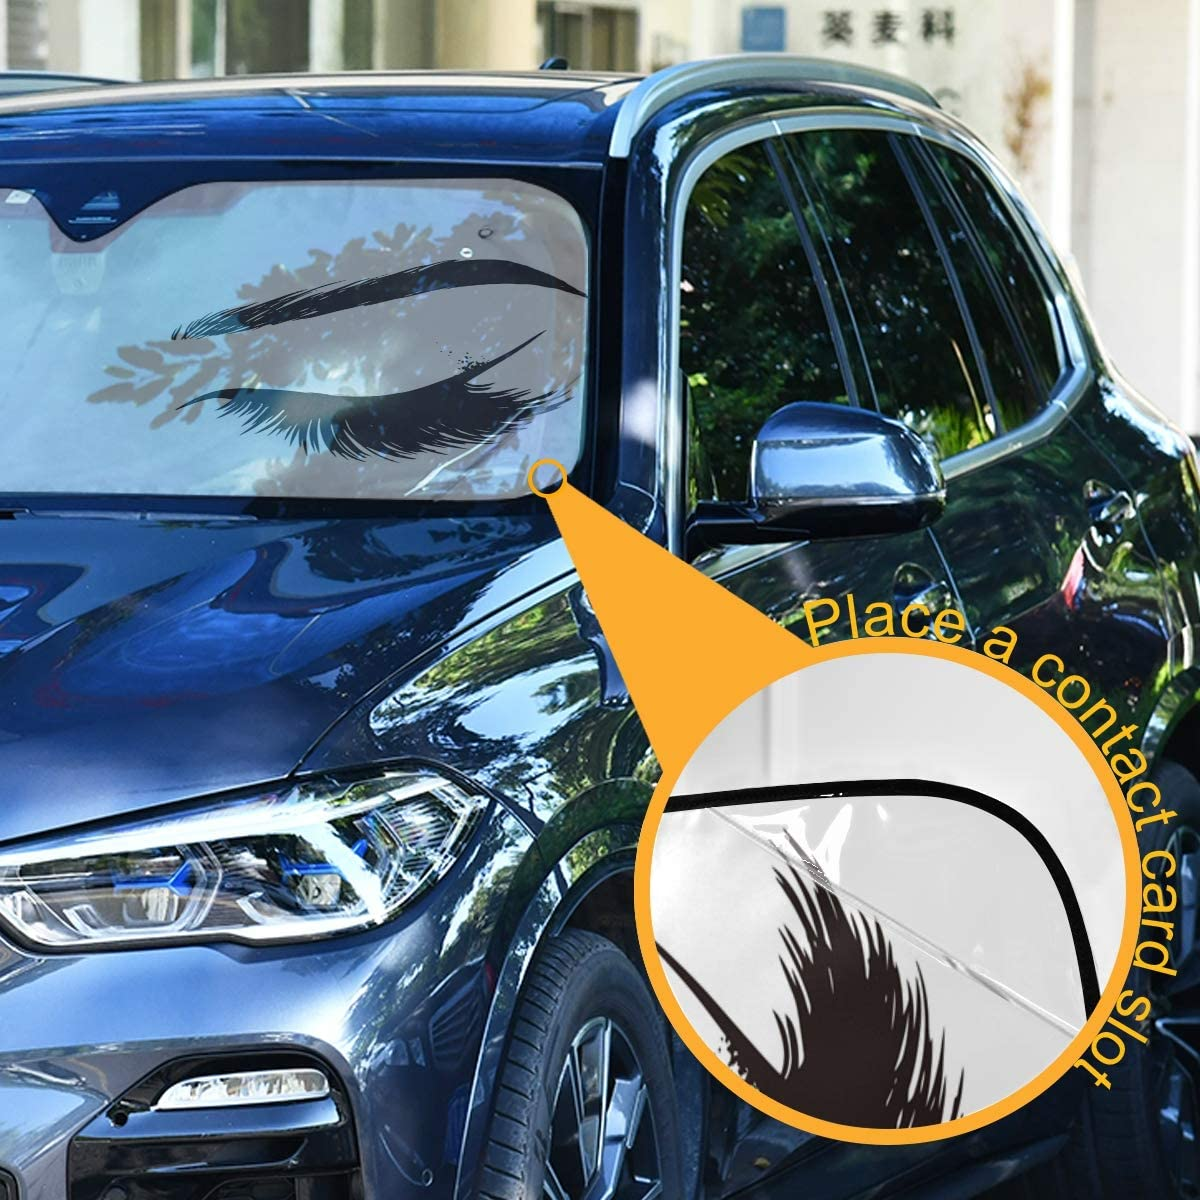 55 x 27.6 Oarencol Women Eyes Car Windshield Sun Shade Foldable UV Ray Sun Visor Protector Sunshade to Keep Your Vehicle Cool